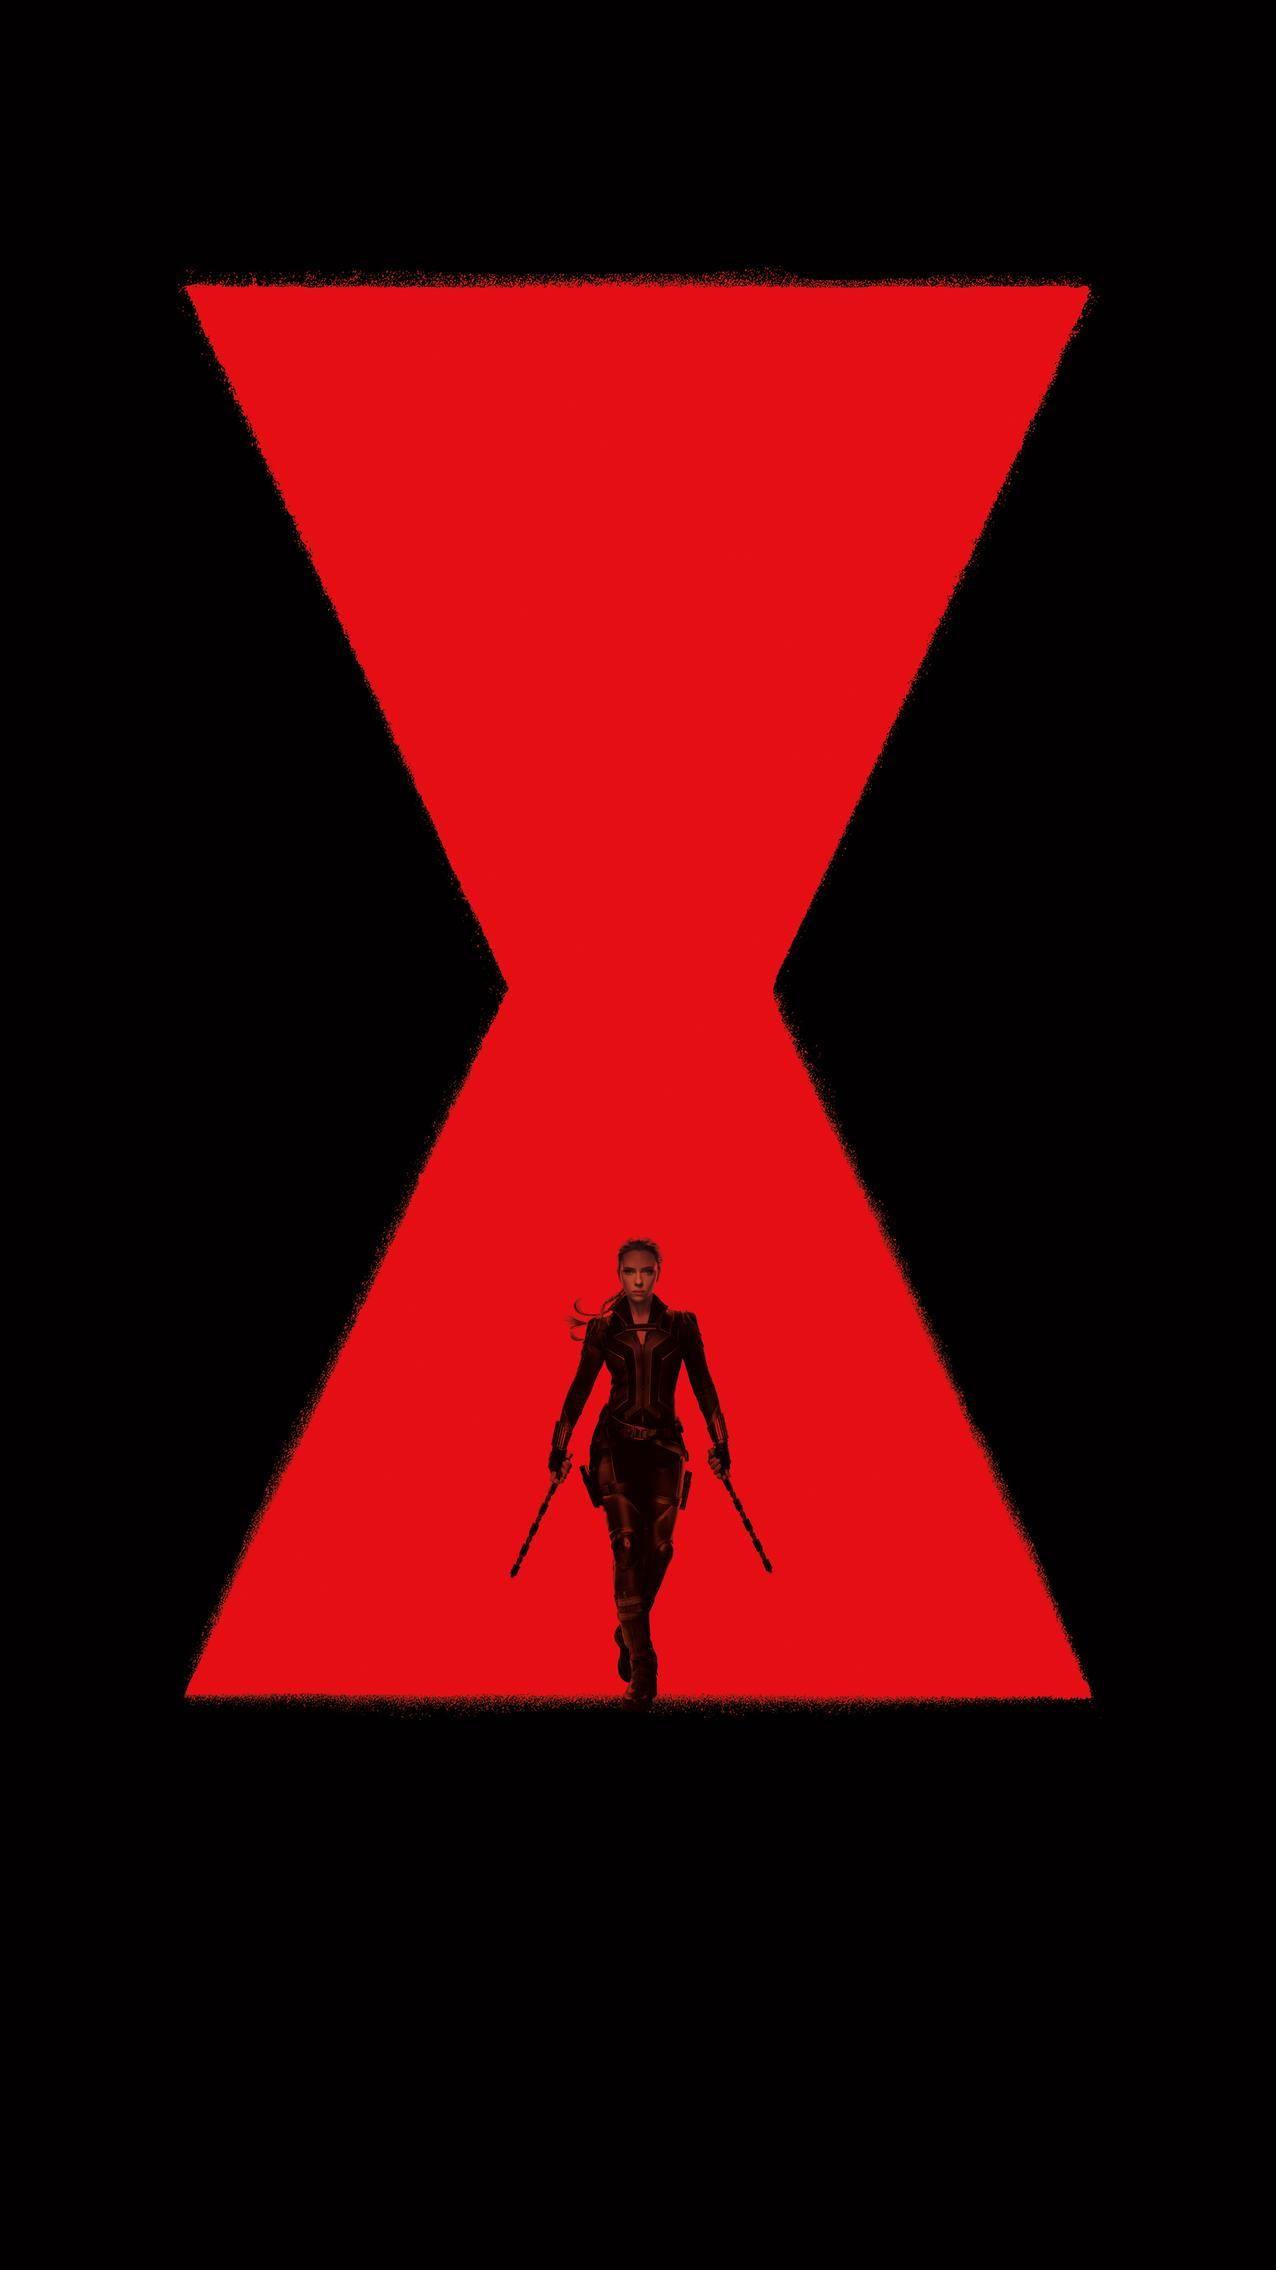 Black Widow (2021) Phone Wallpaper | Moviemania